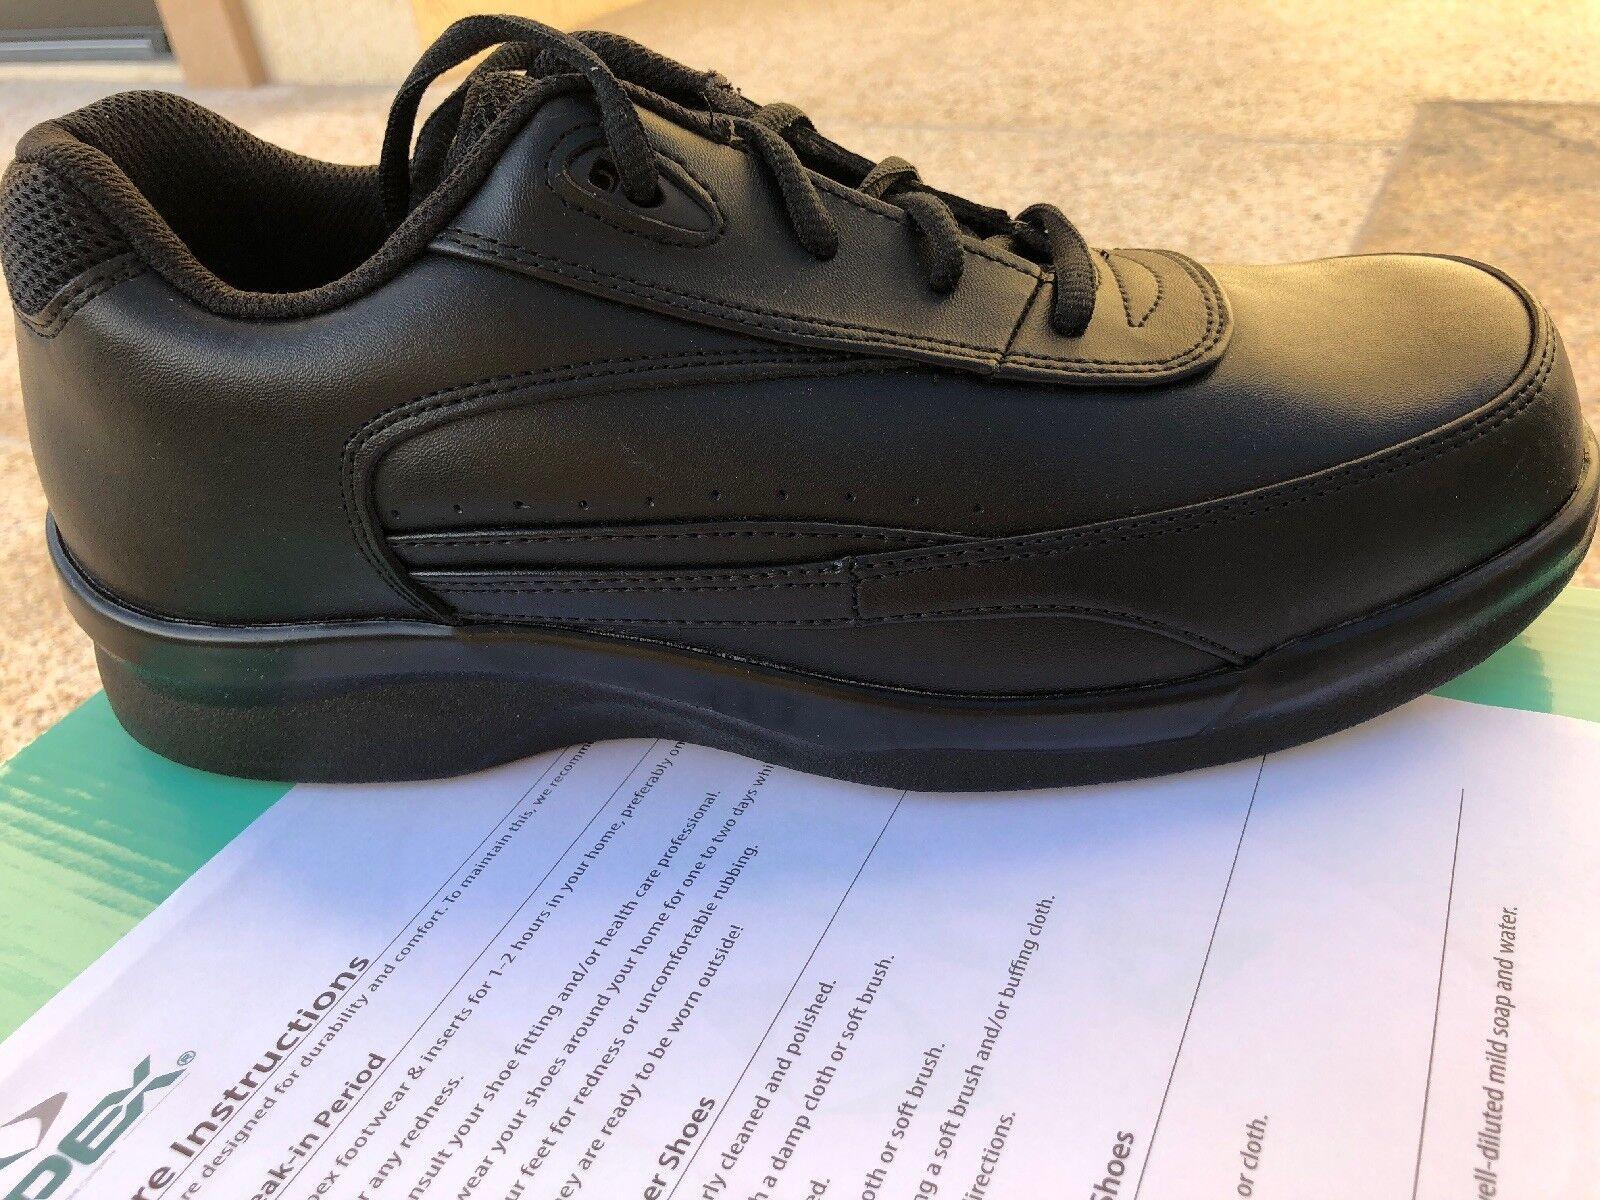 Apex G7000 Diabetic Ambulator Orthopedic Diabetic G7000 Supportive Shoes Uomo f921b0